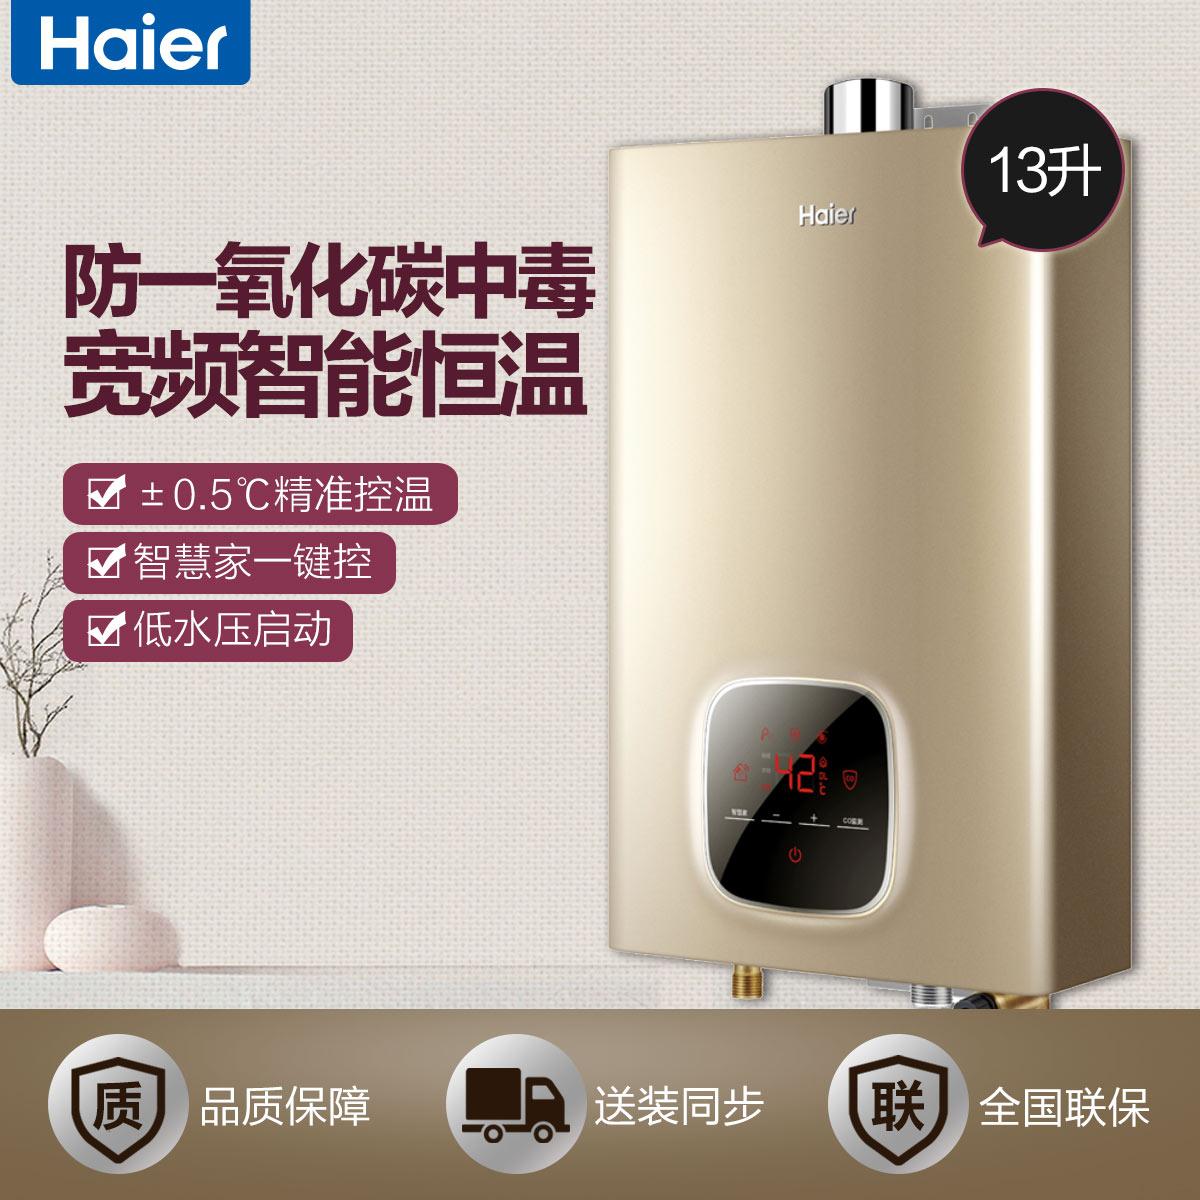 Haier/海尔 燃气热水器 JSQ25-13WT5(12T)